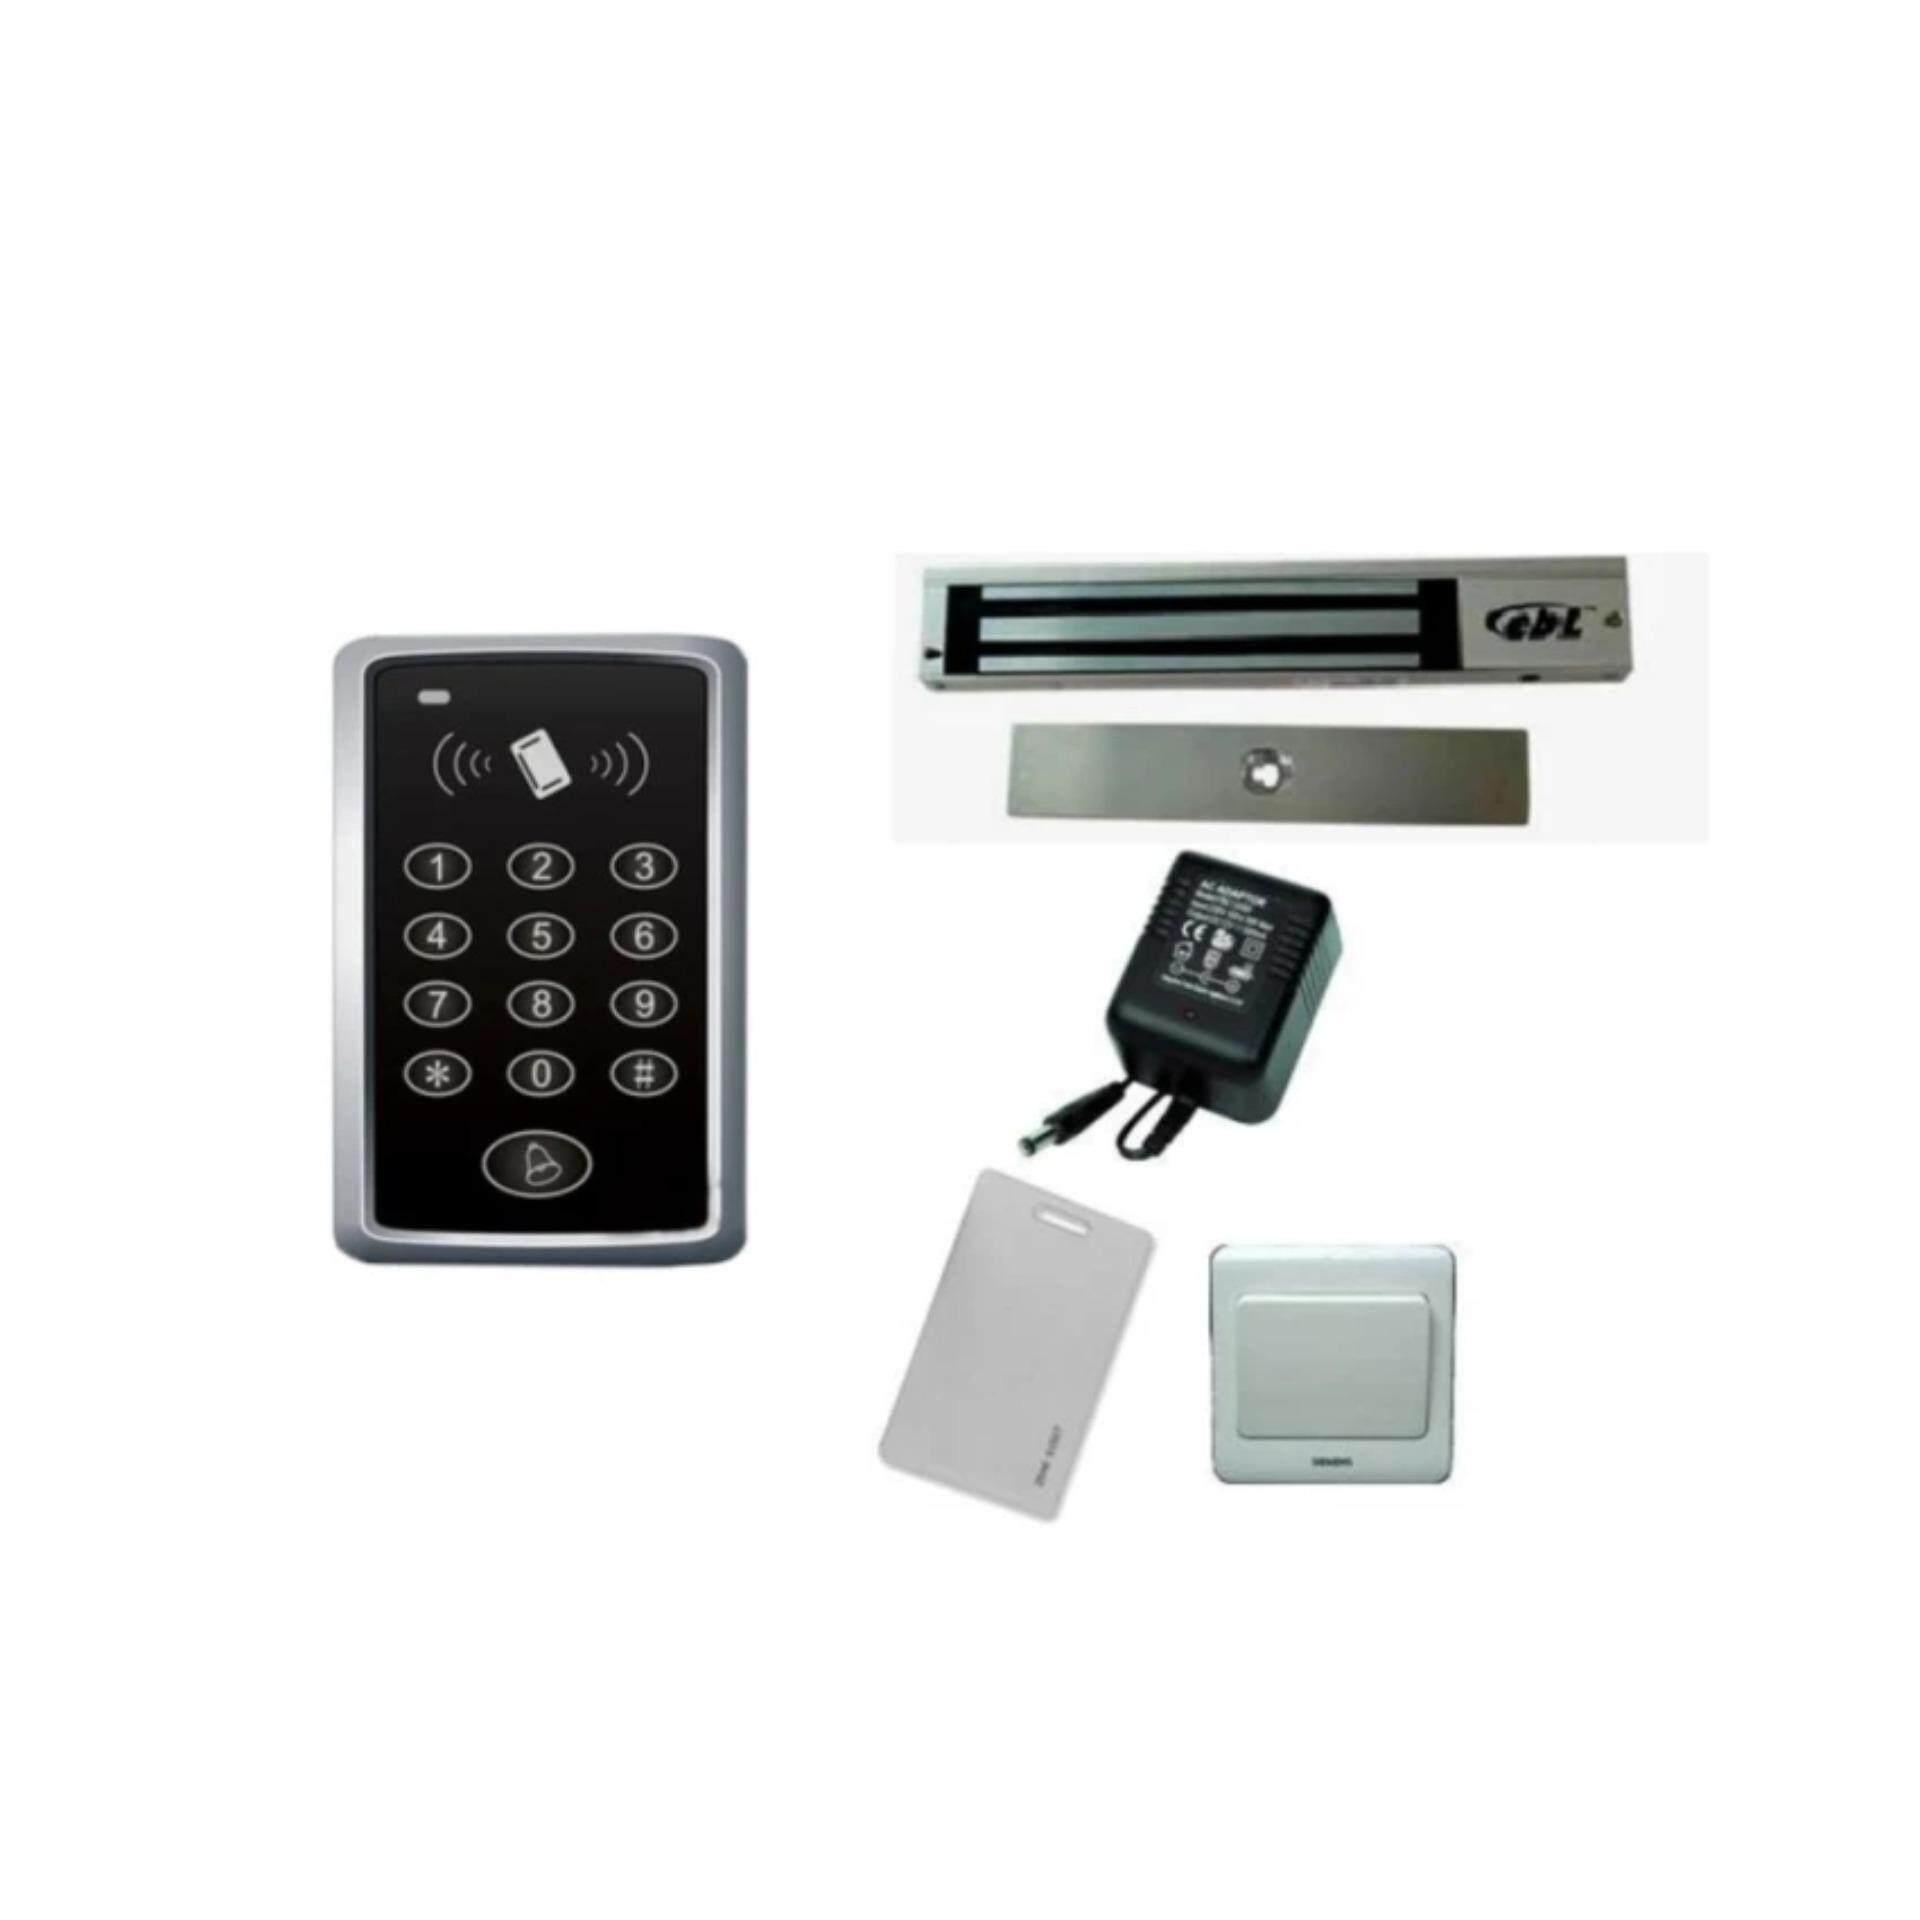 RFID DOOR ACCESS CARD SYSTEM DOOR LOCK + 8 YEARS WARRANTY